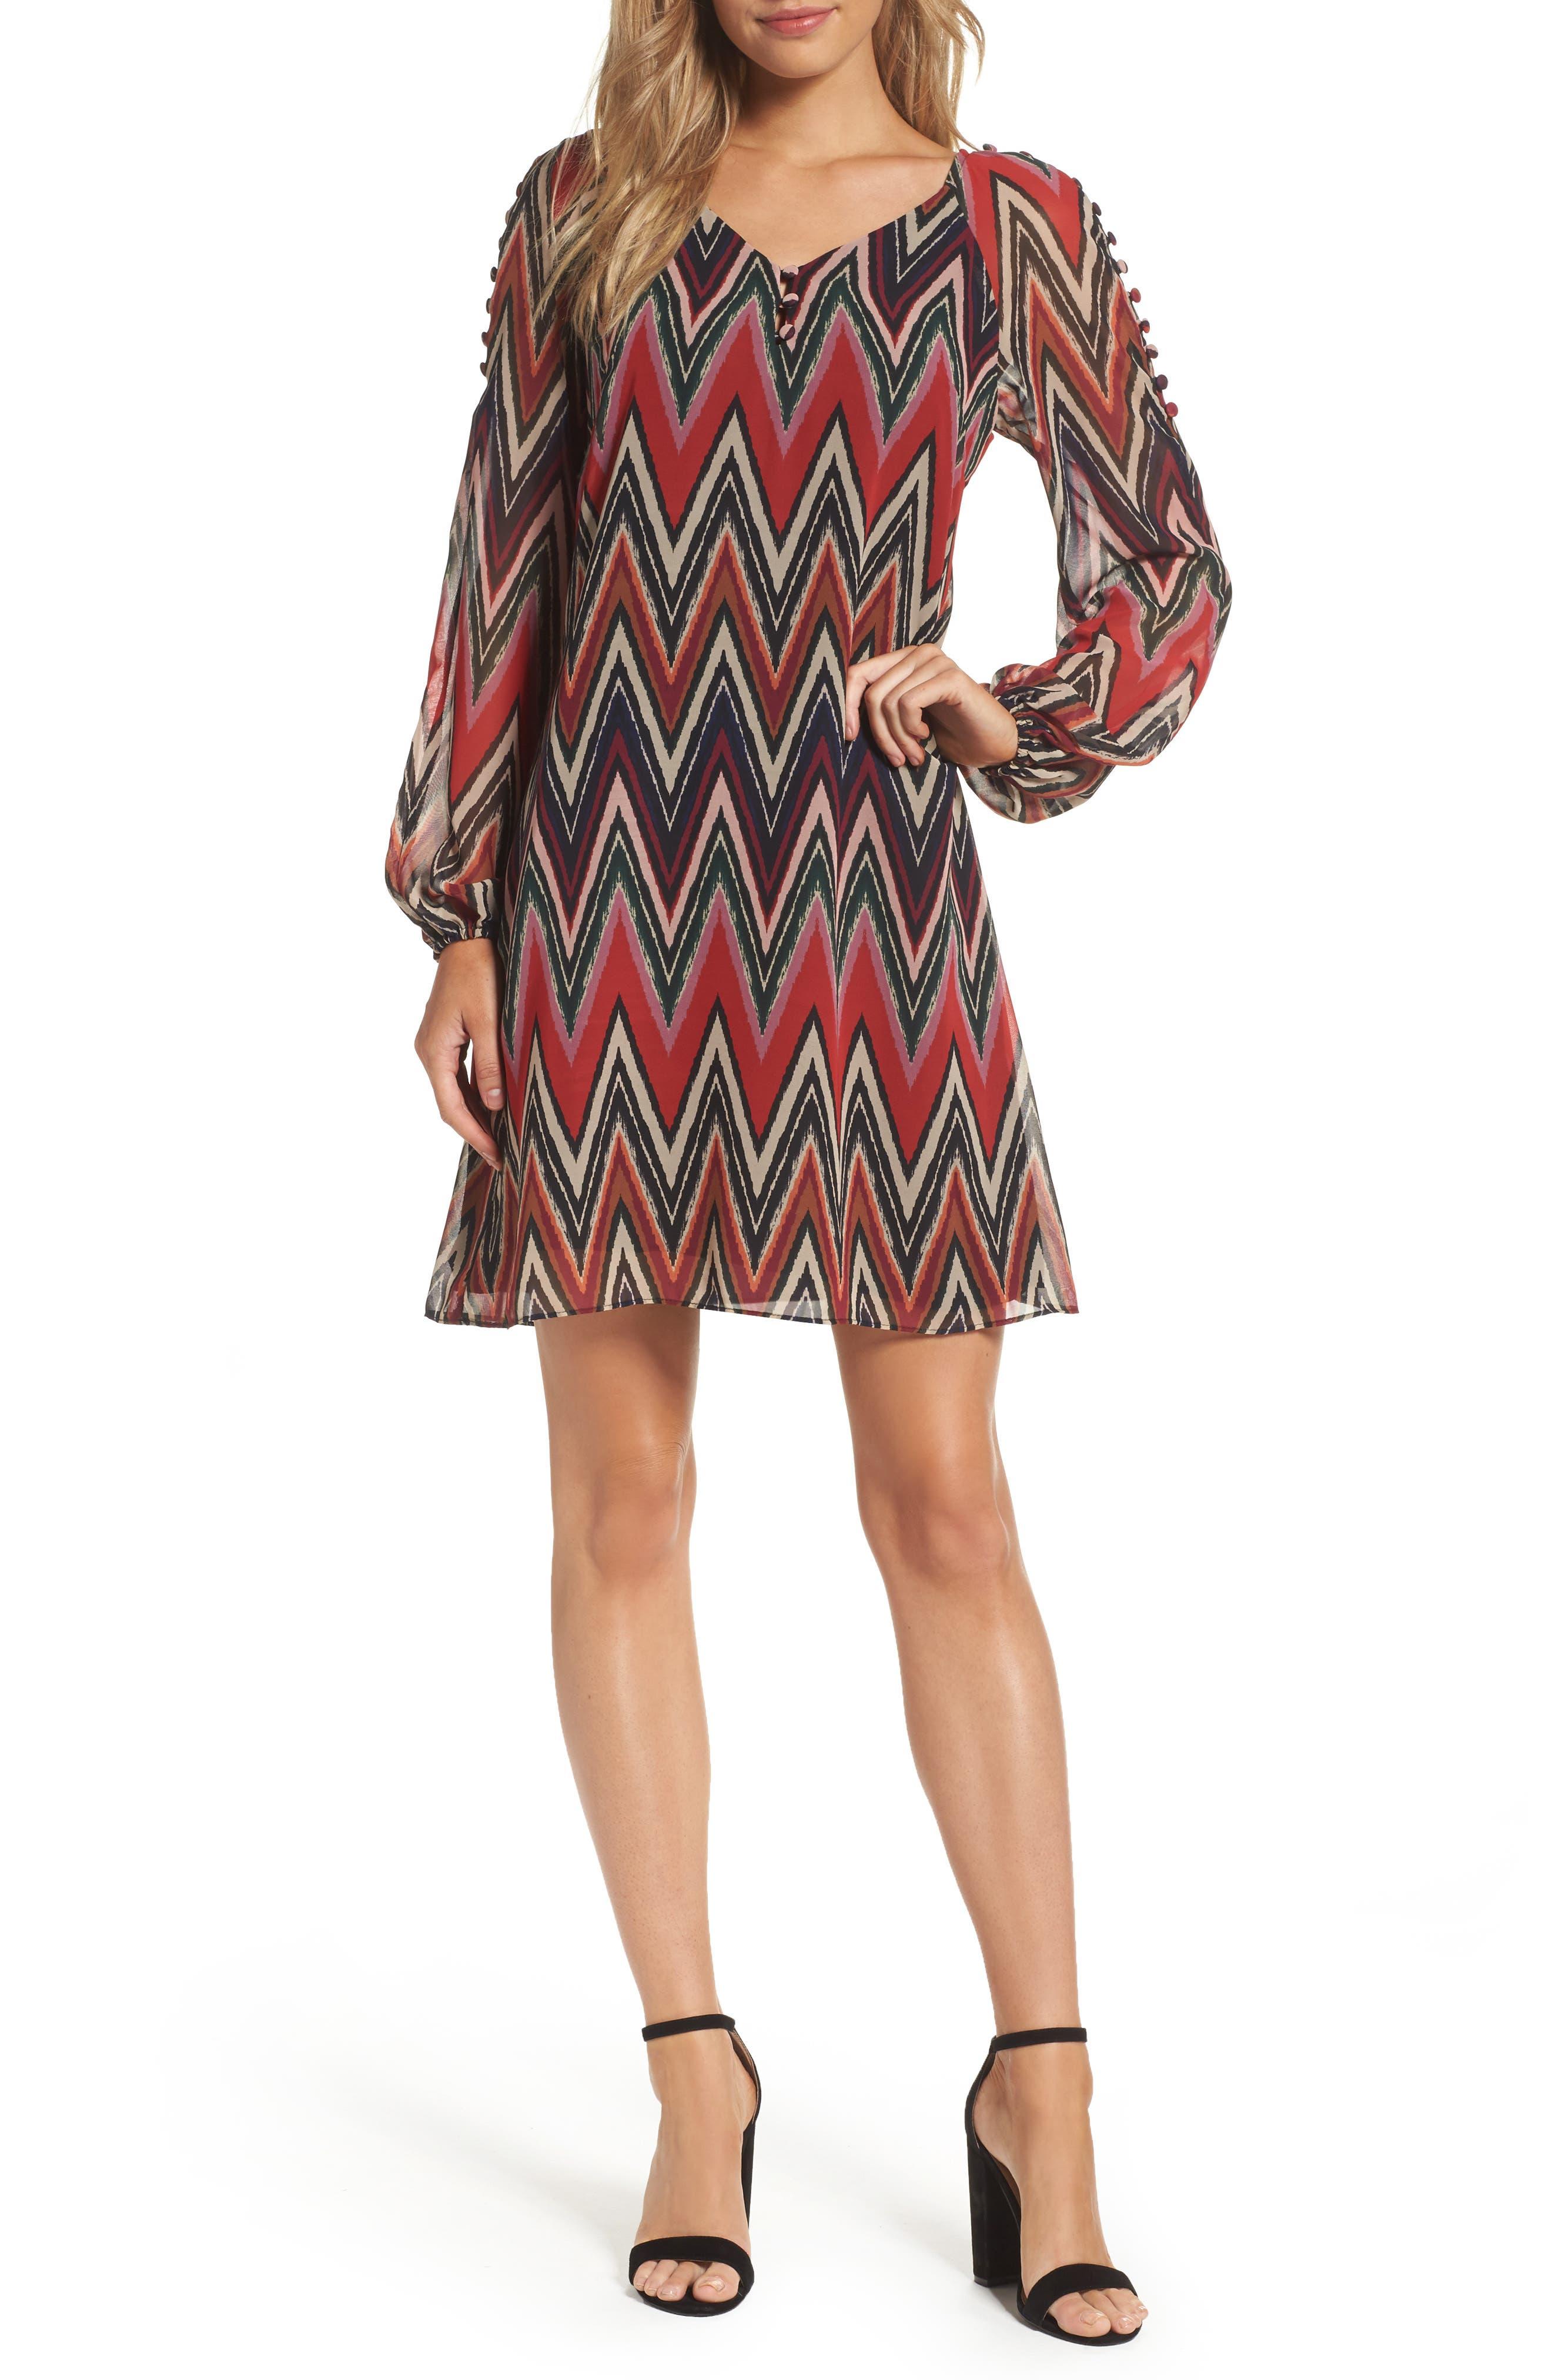 Chevron Swing Dress,                             Main thumbnail 1, color,                             600